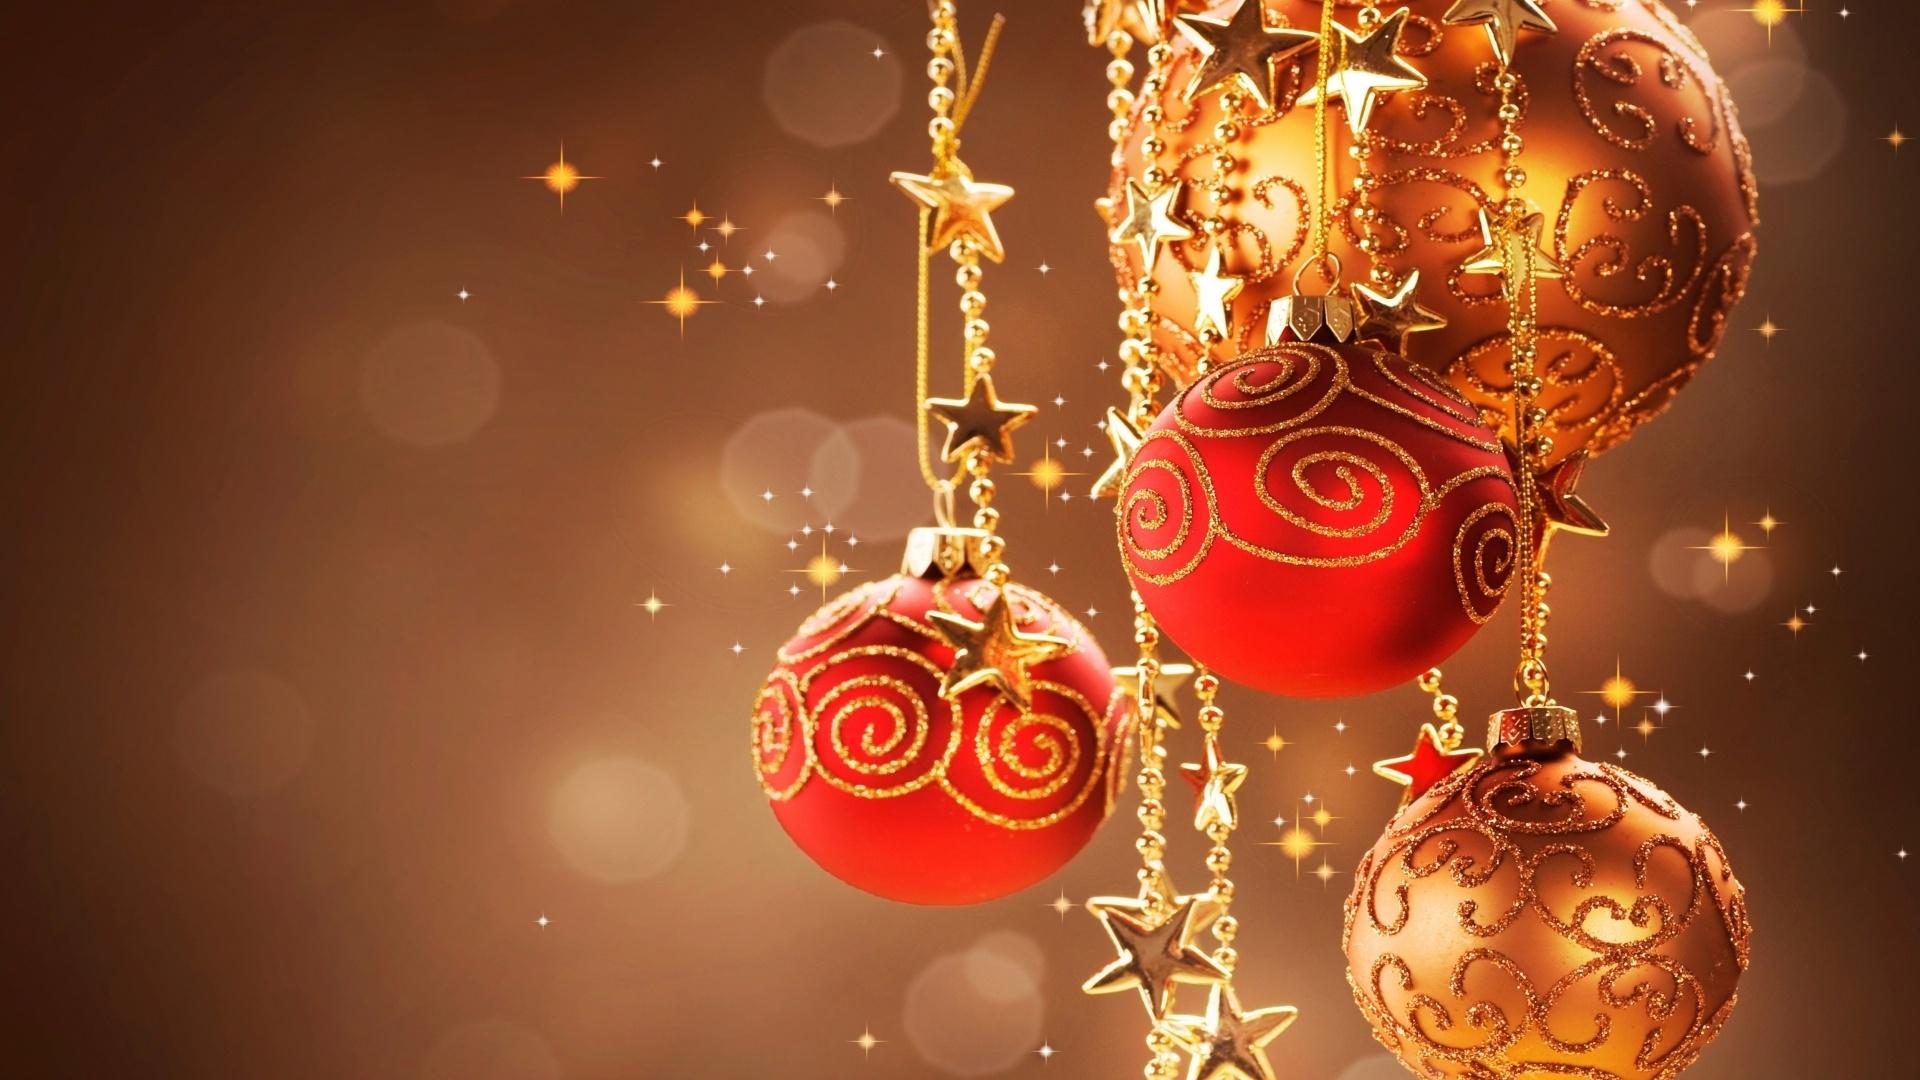 christmas-screen-themes-Google-Search-wallpaper-wpc5803471